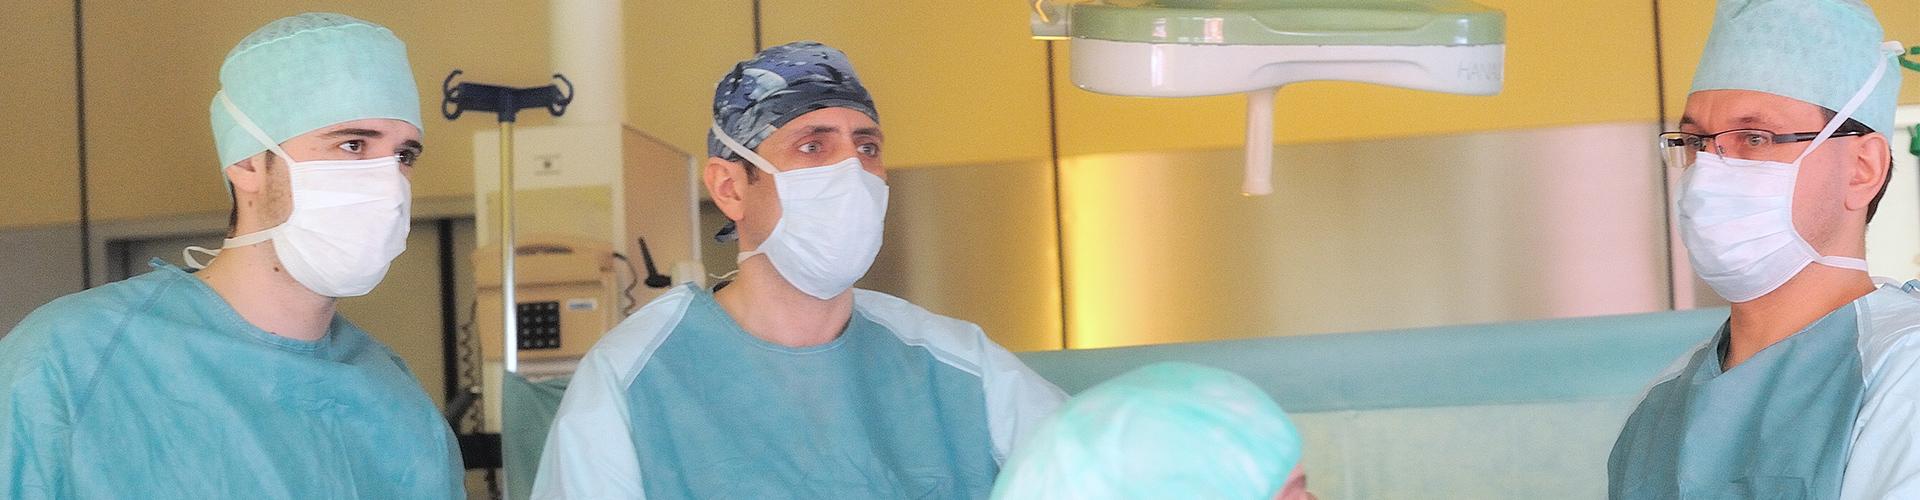 Bild passend zu Endometriosezentrum